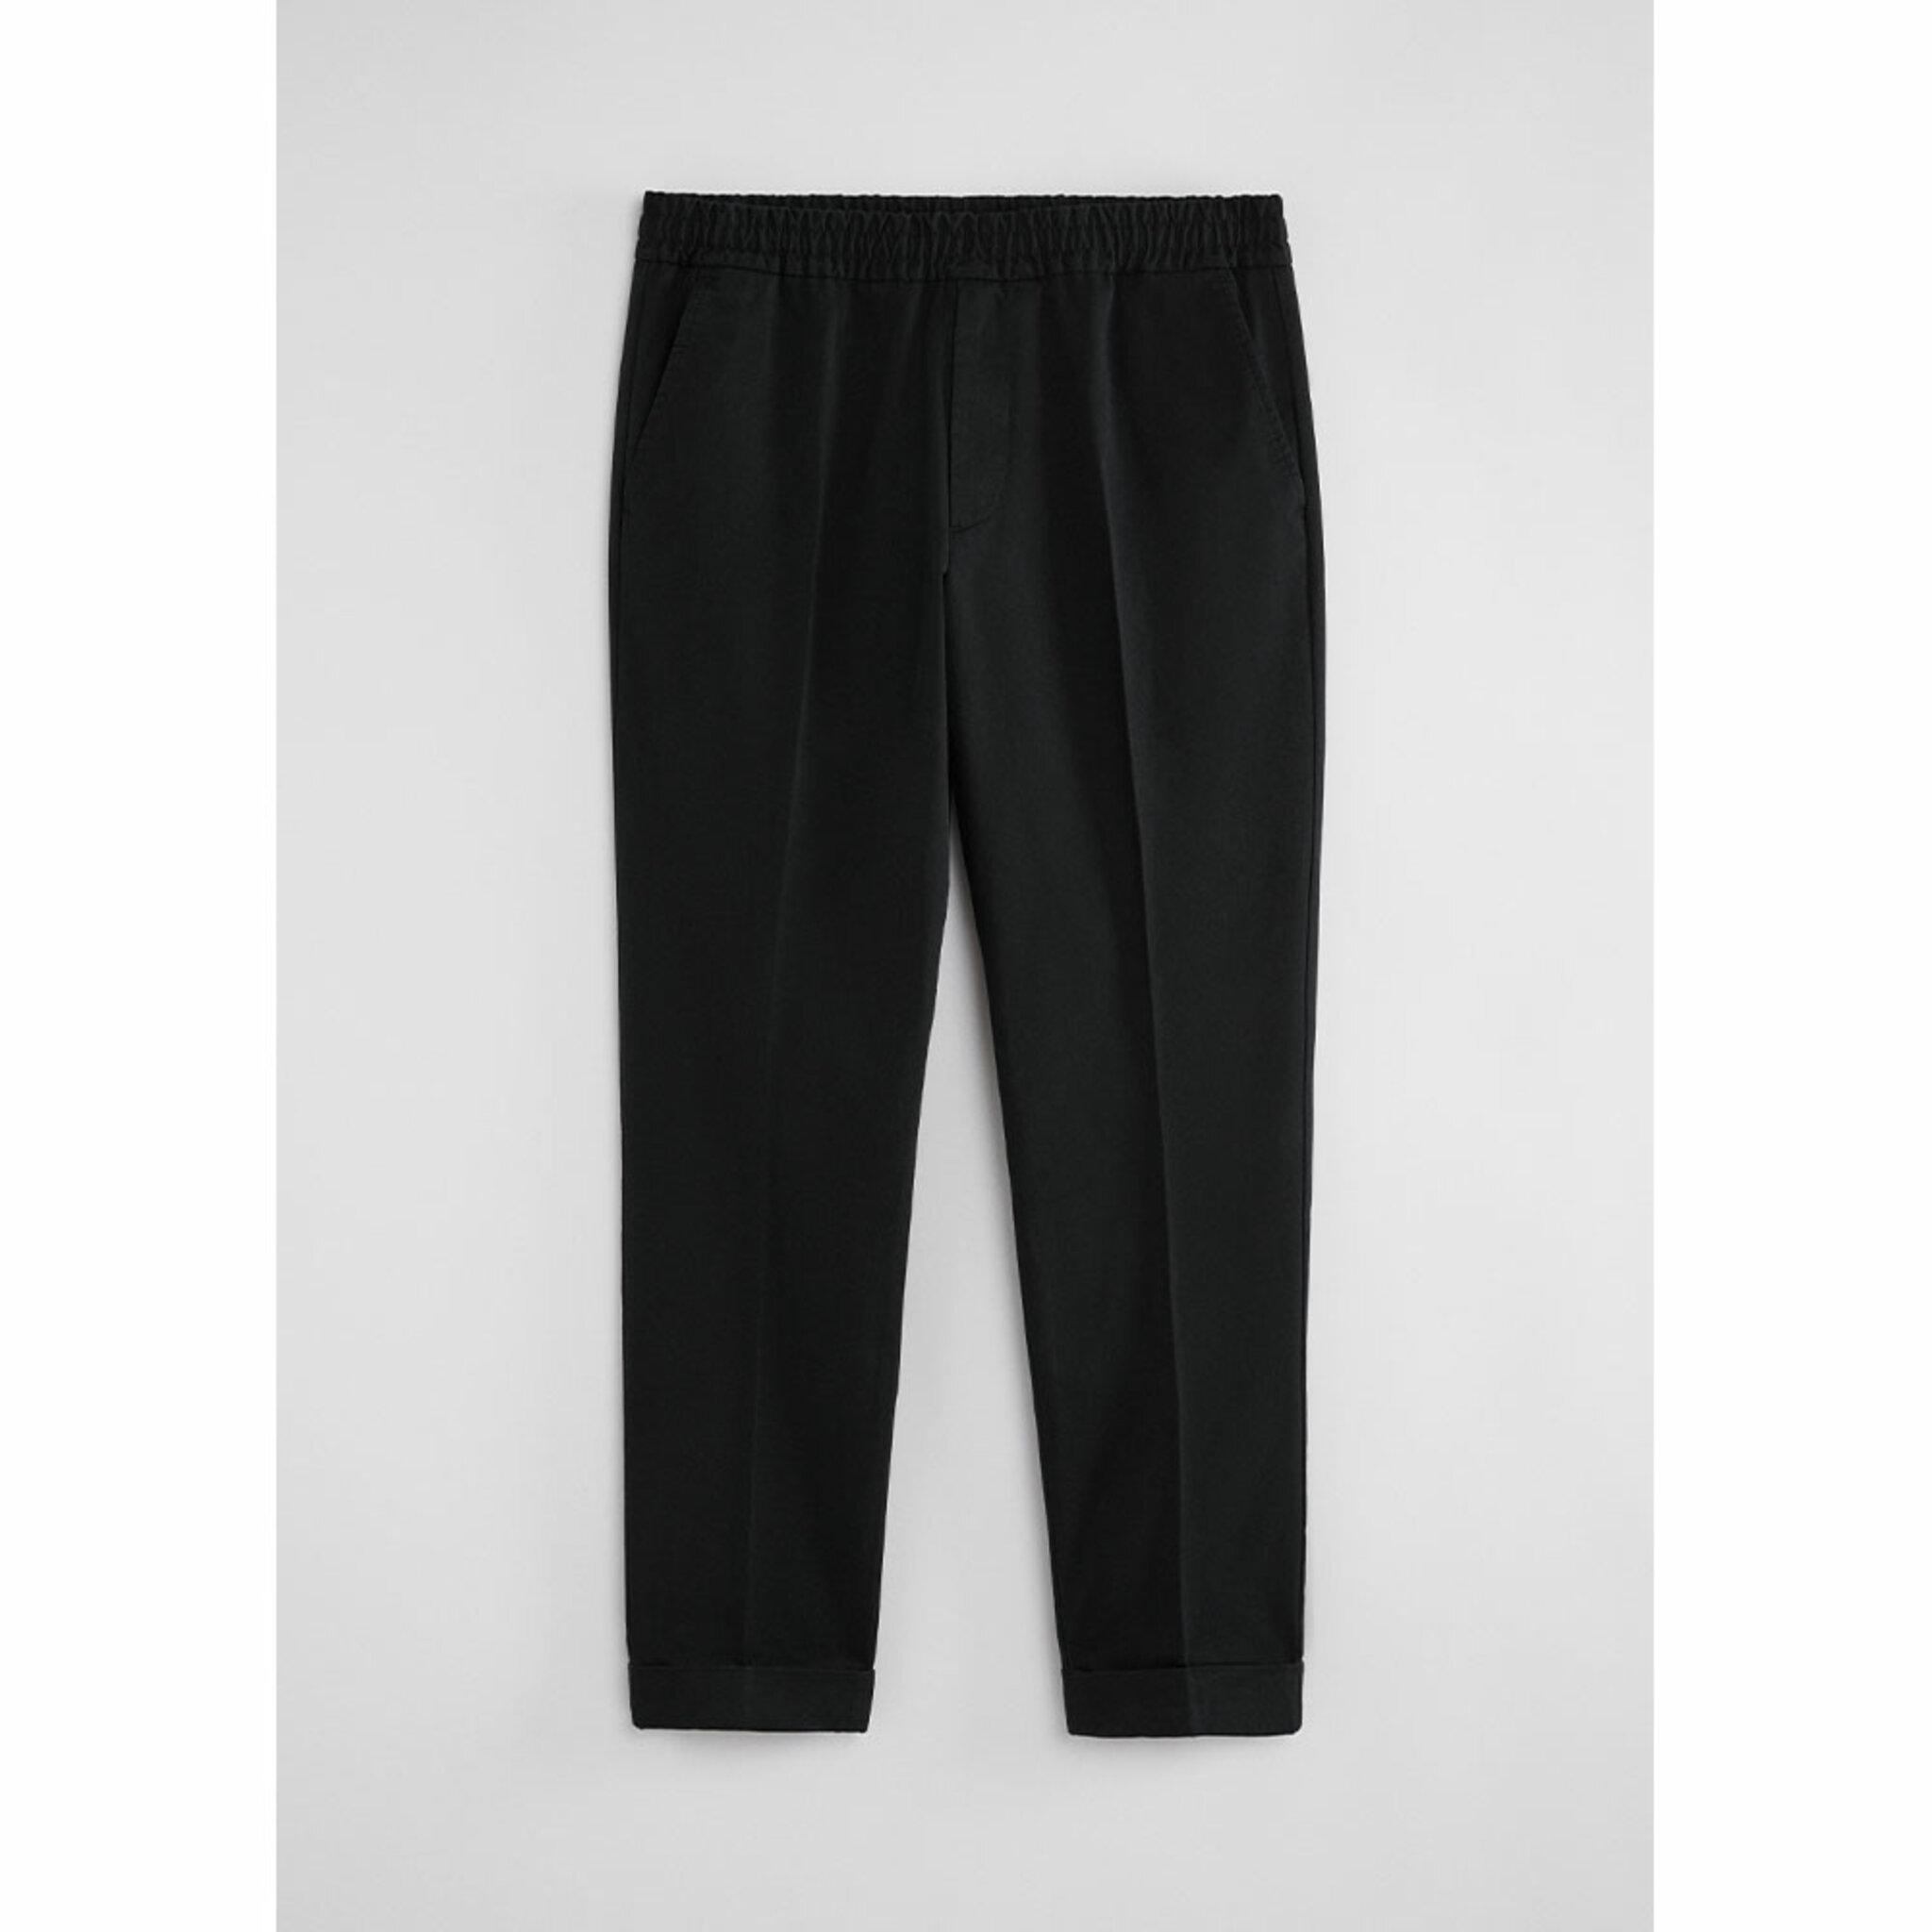 M. Terry Cotton Trouser